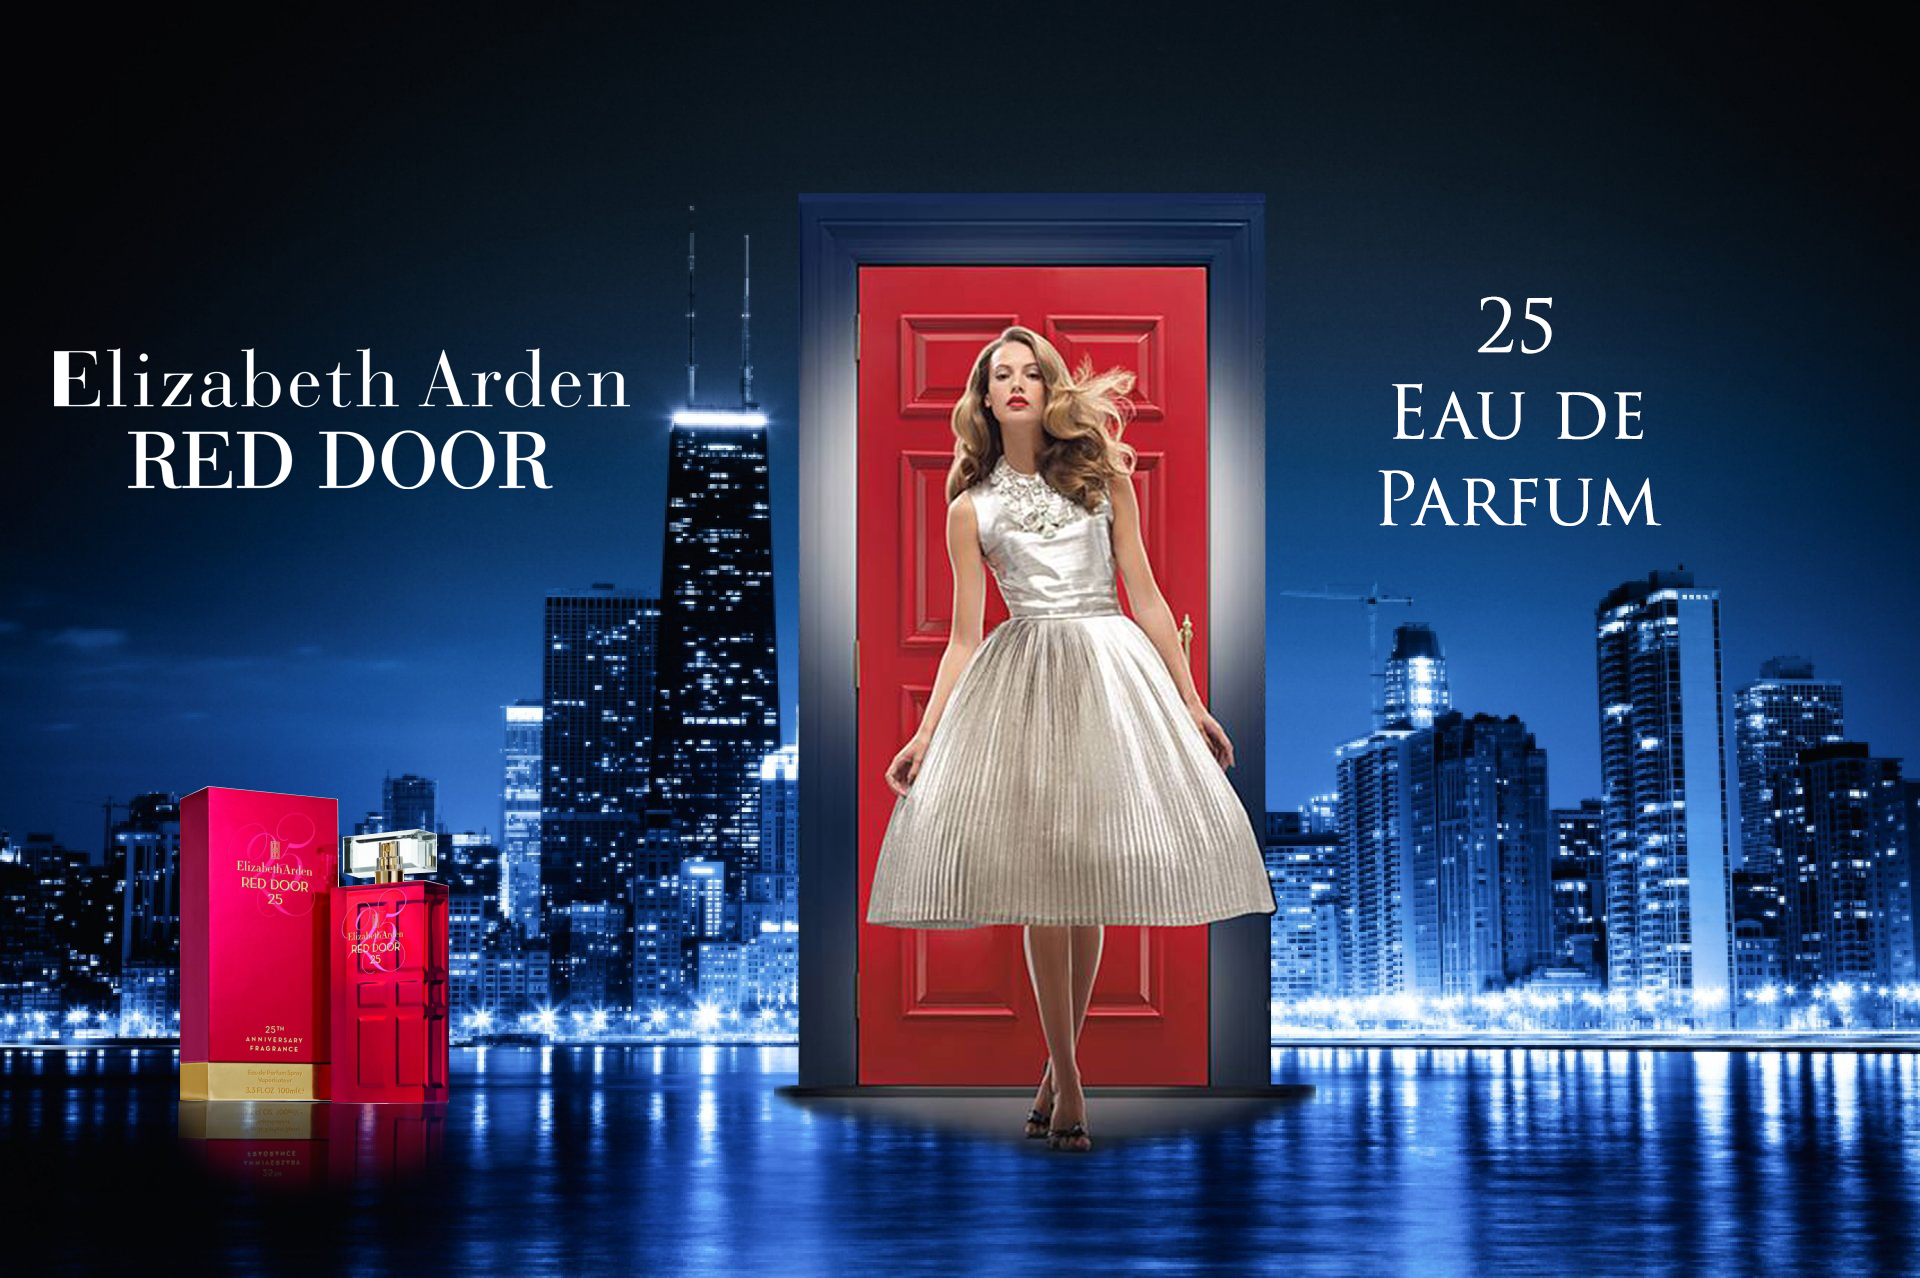 Red Door 25 Eau De Parfum Elizabeth Arden Perfume A New